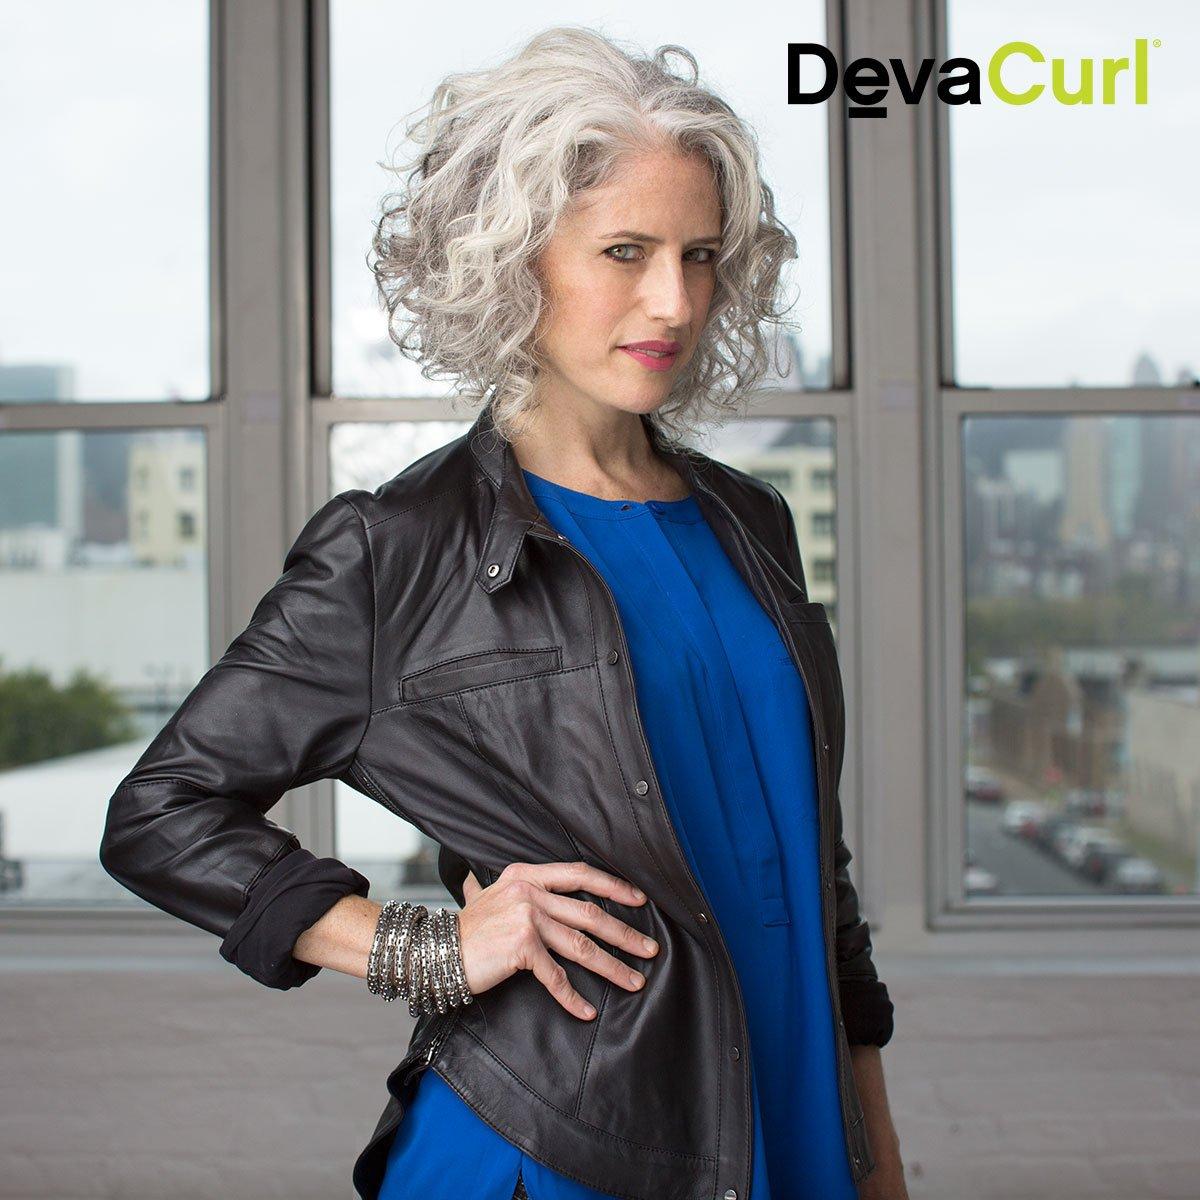 DevaCurl.TheMultitasker